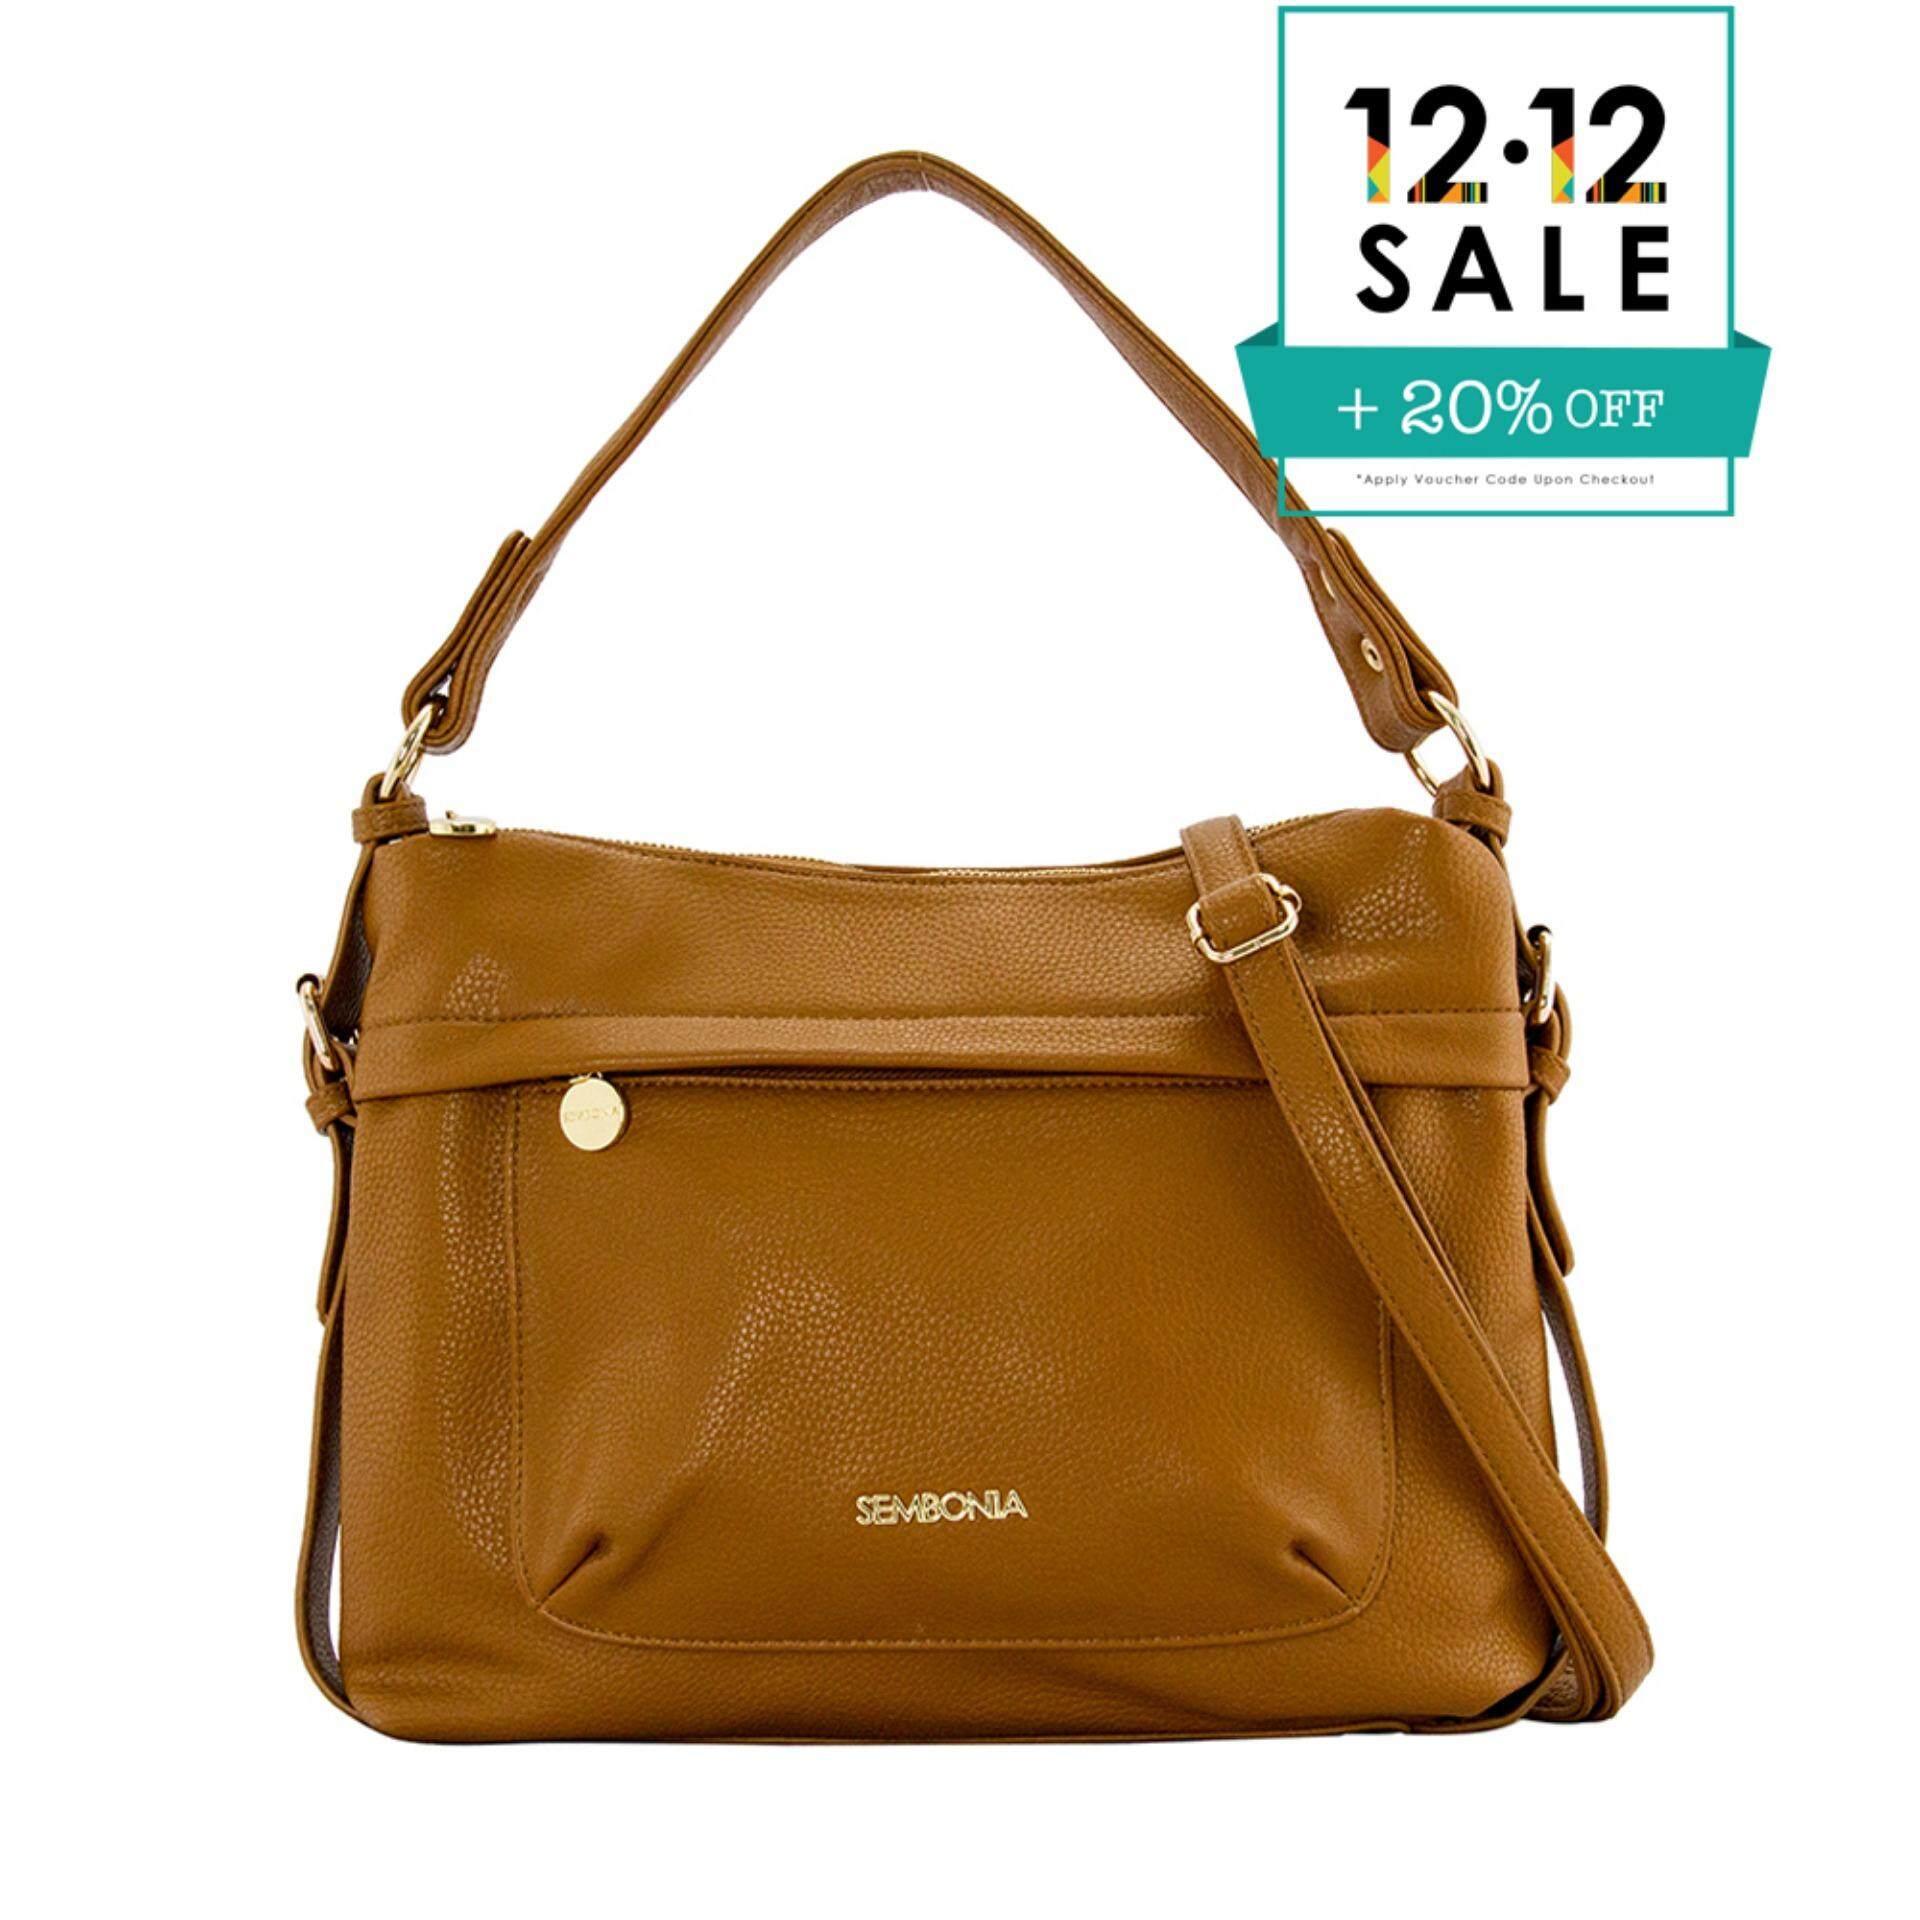 Sembonia Synthetic Leather Hobo Bag Brown